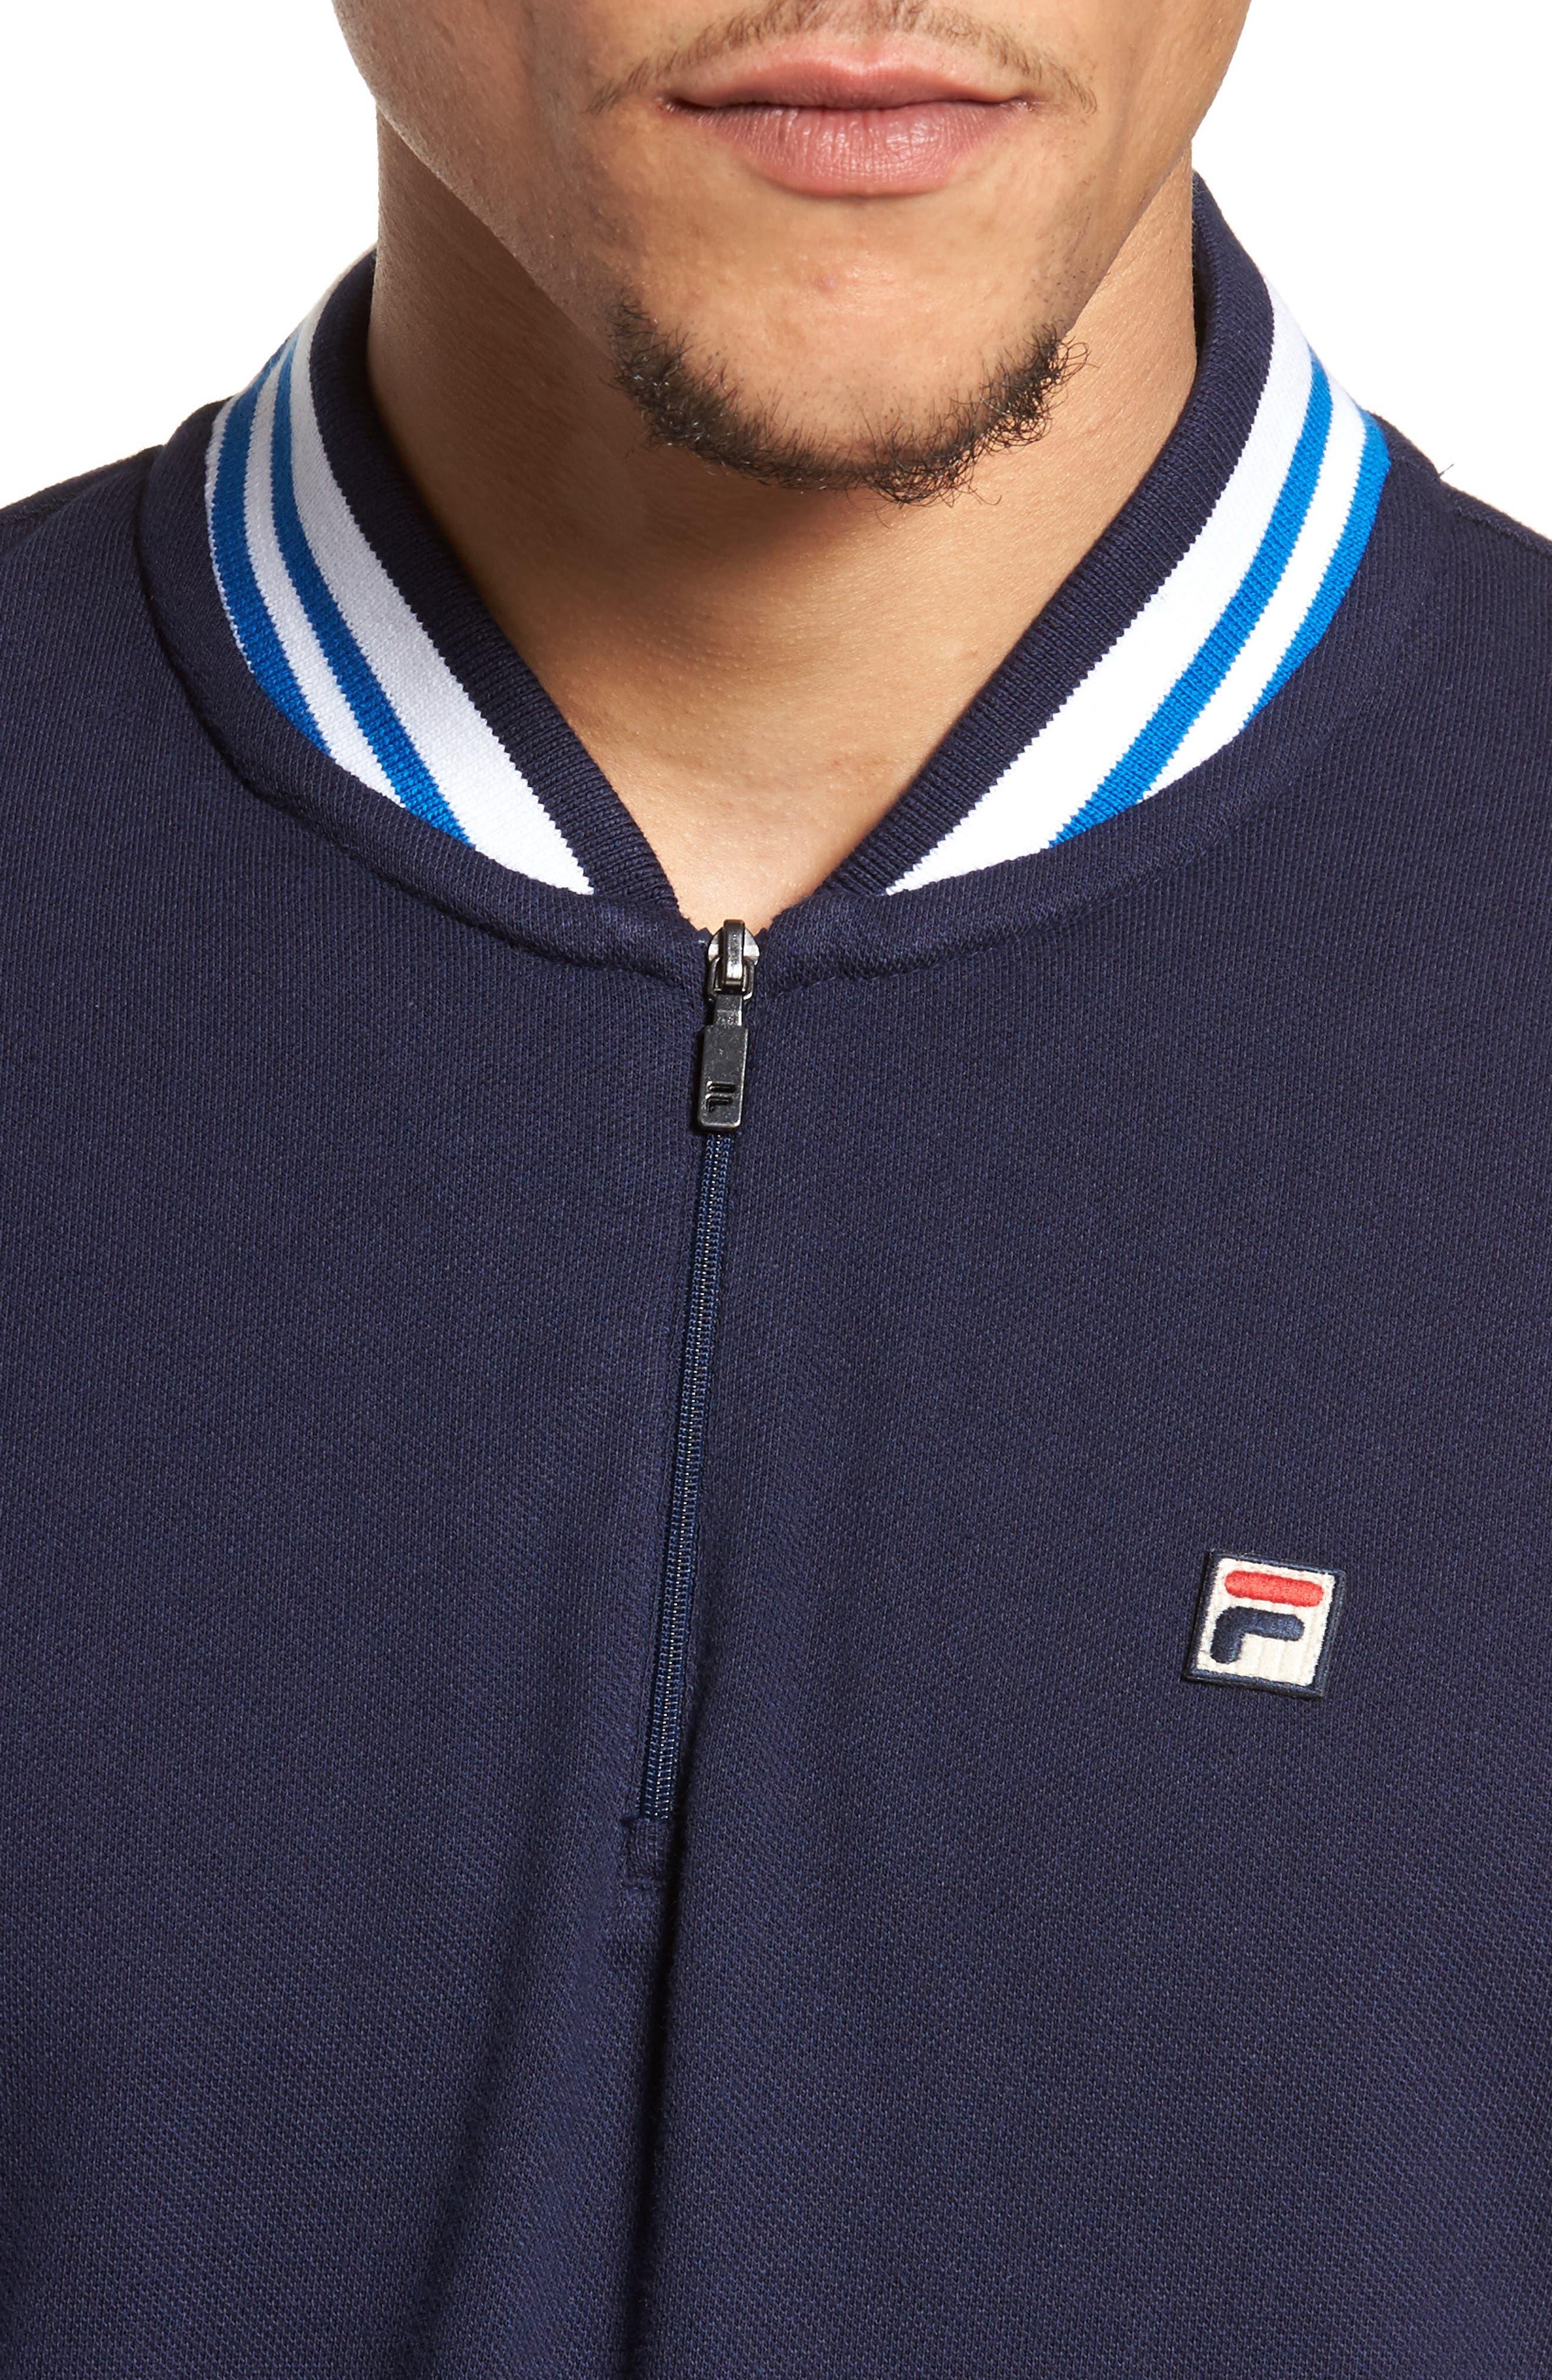 Moretti Short Sleeve Zip Henley Shirt,                             Alternate thumbnail 4, color,                             001